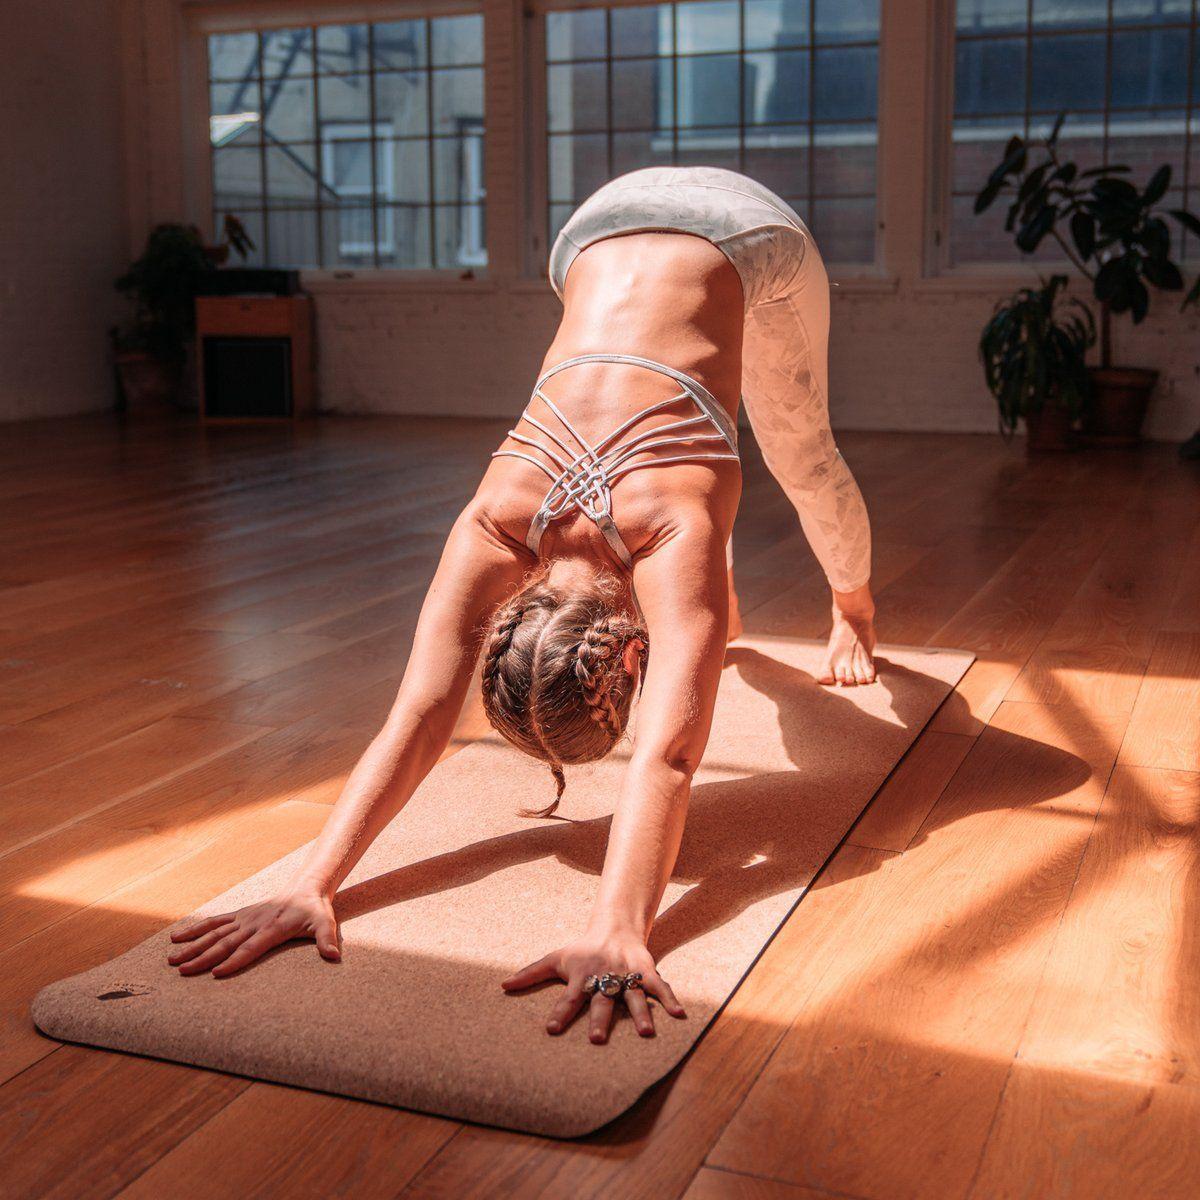 "Cork Yoga Mat ""The Robin"" #corkyogamat Non-Slip Hot & Cork Yoga Mat | 42 Birds #corkyogamat Cork Yoga Mat ""The Robin"" #corkyogamat Non-Slip Hot & Cork Yoga Mat | 42 Birds #corkyogamat"